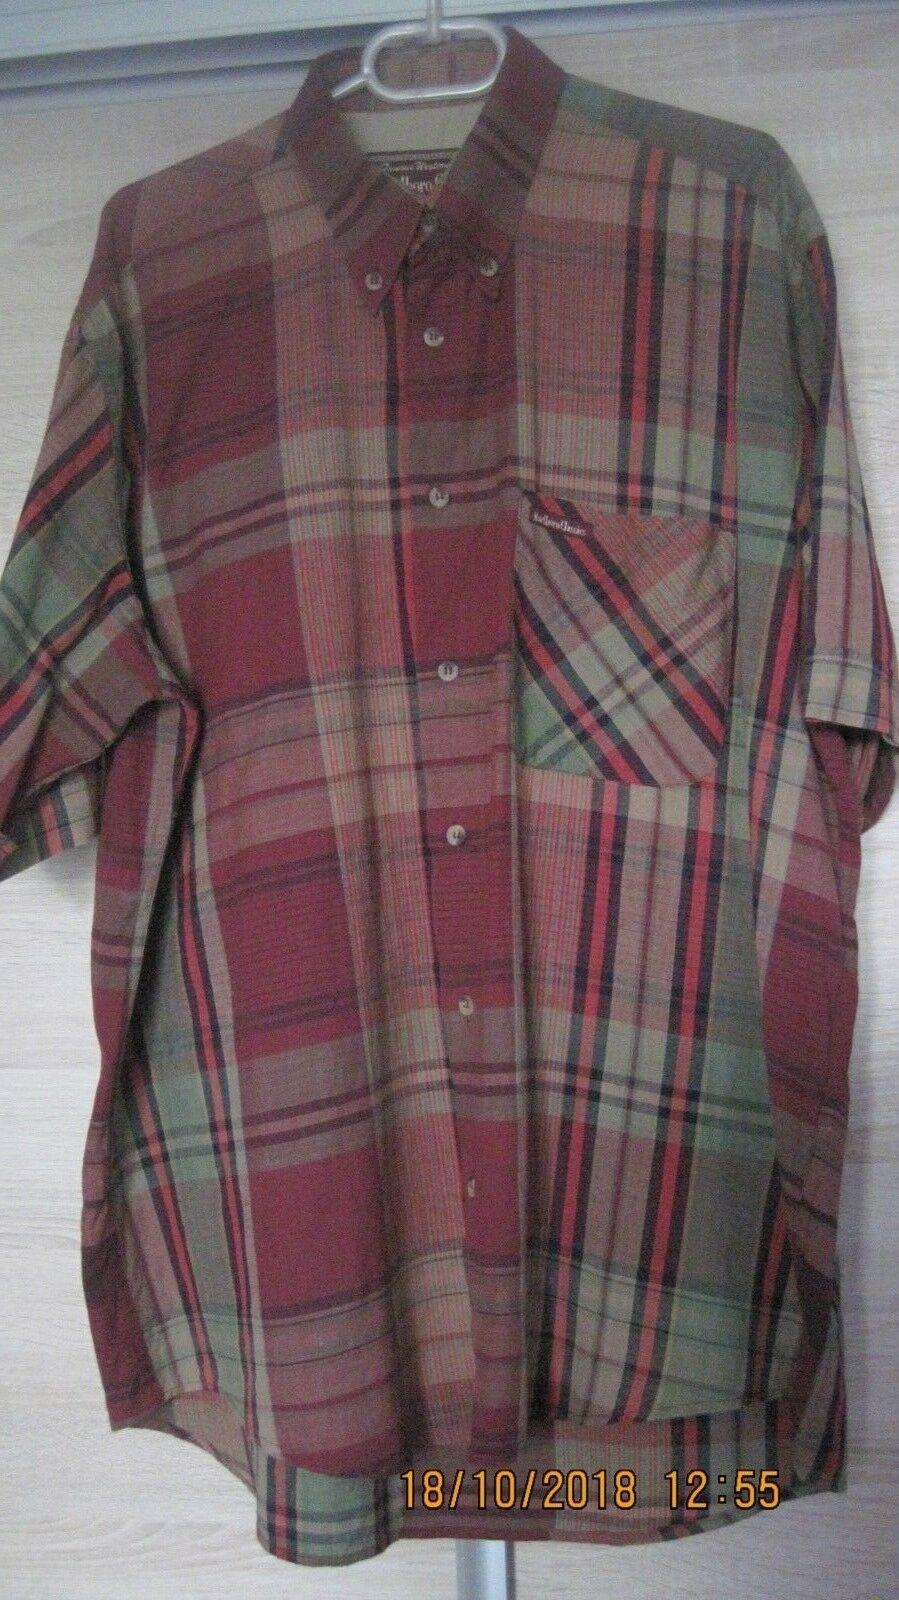 Marlbgold Classics shirt 100% cotton, size XL. Made in USA.